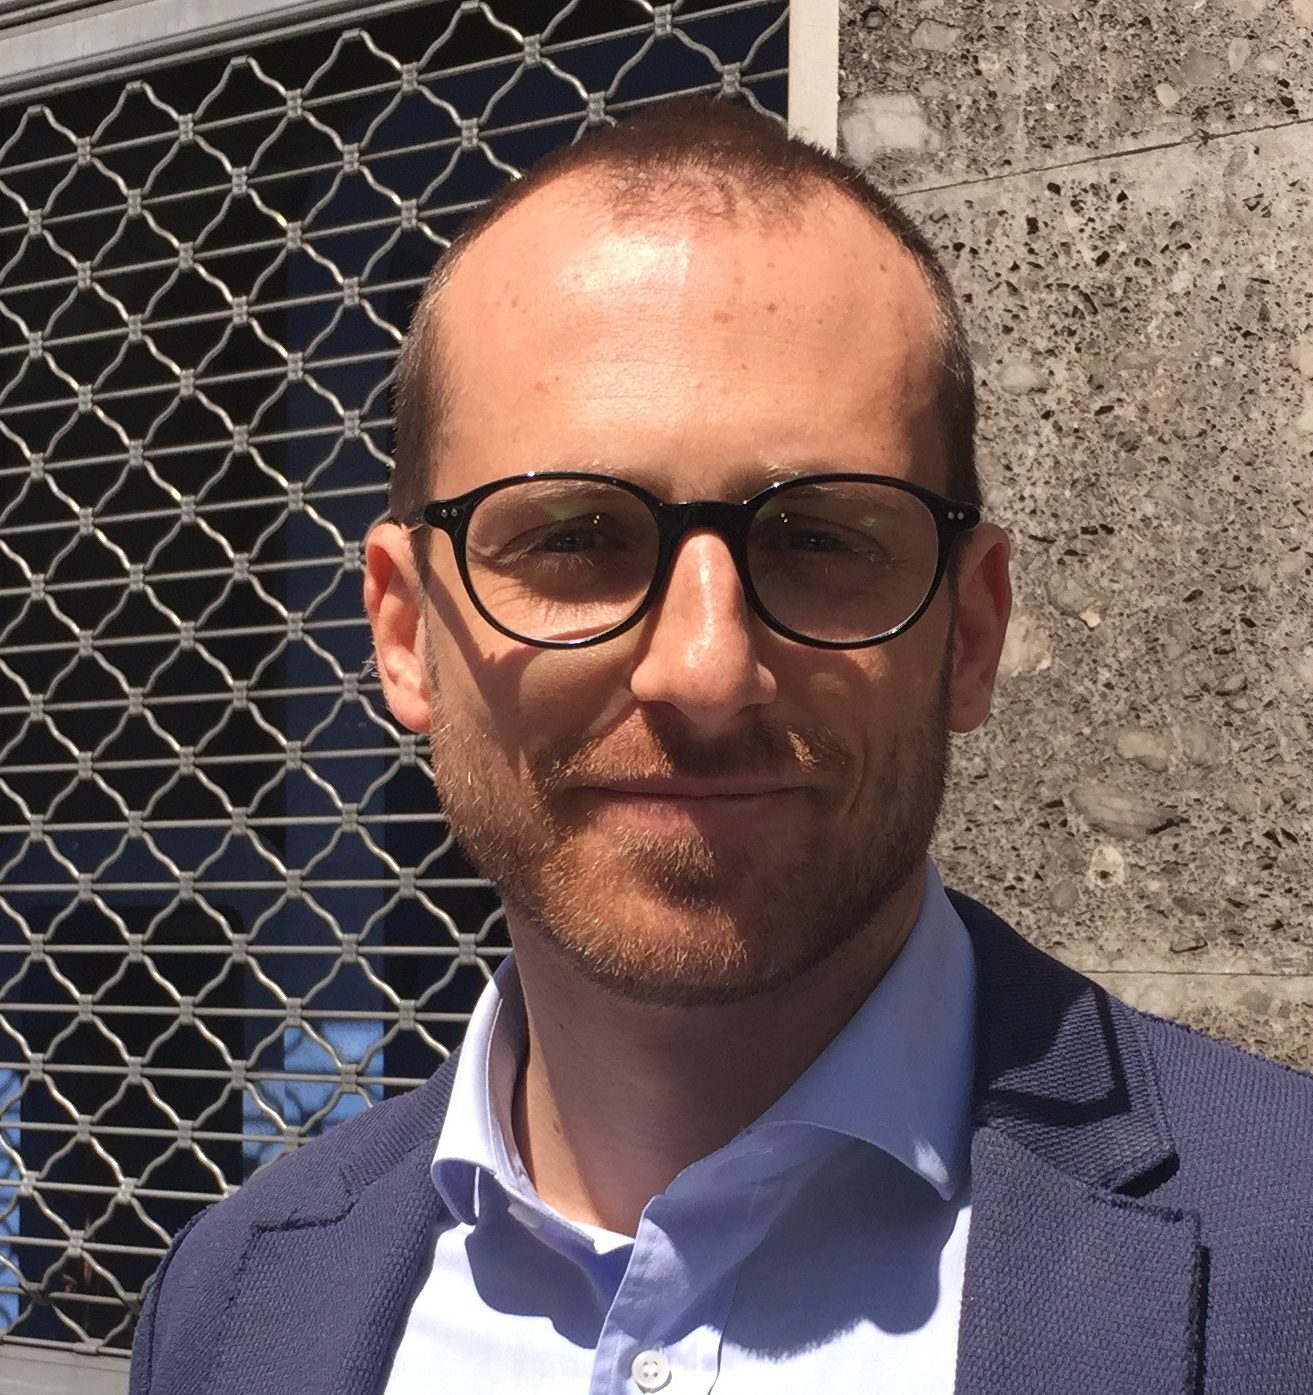 Michele Spallino Master ISTUD Risorse Umane